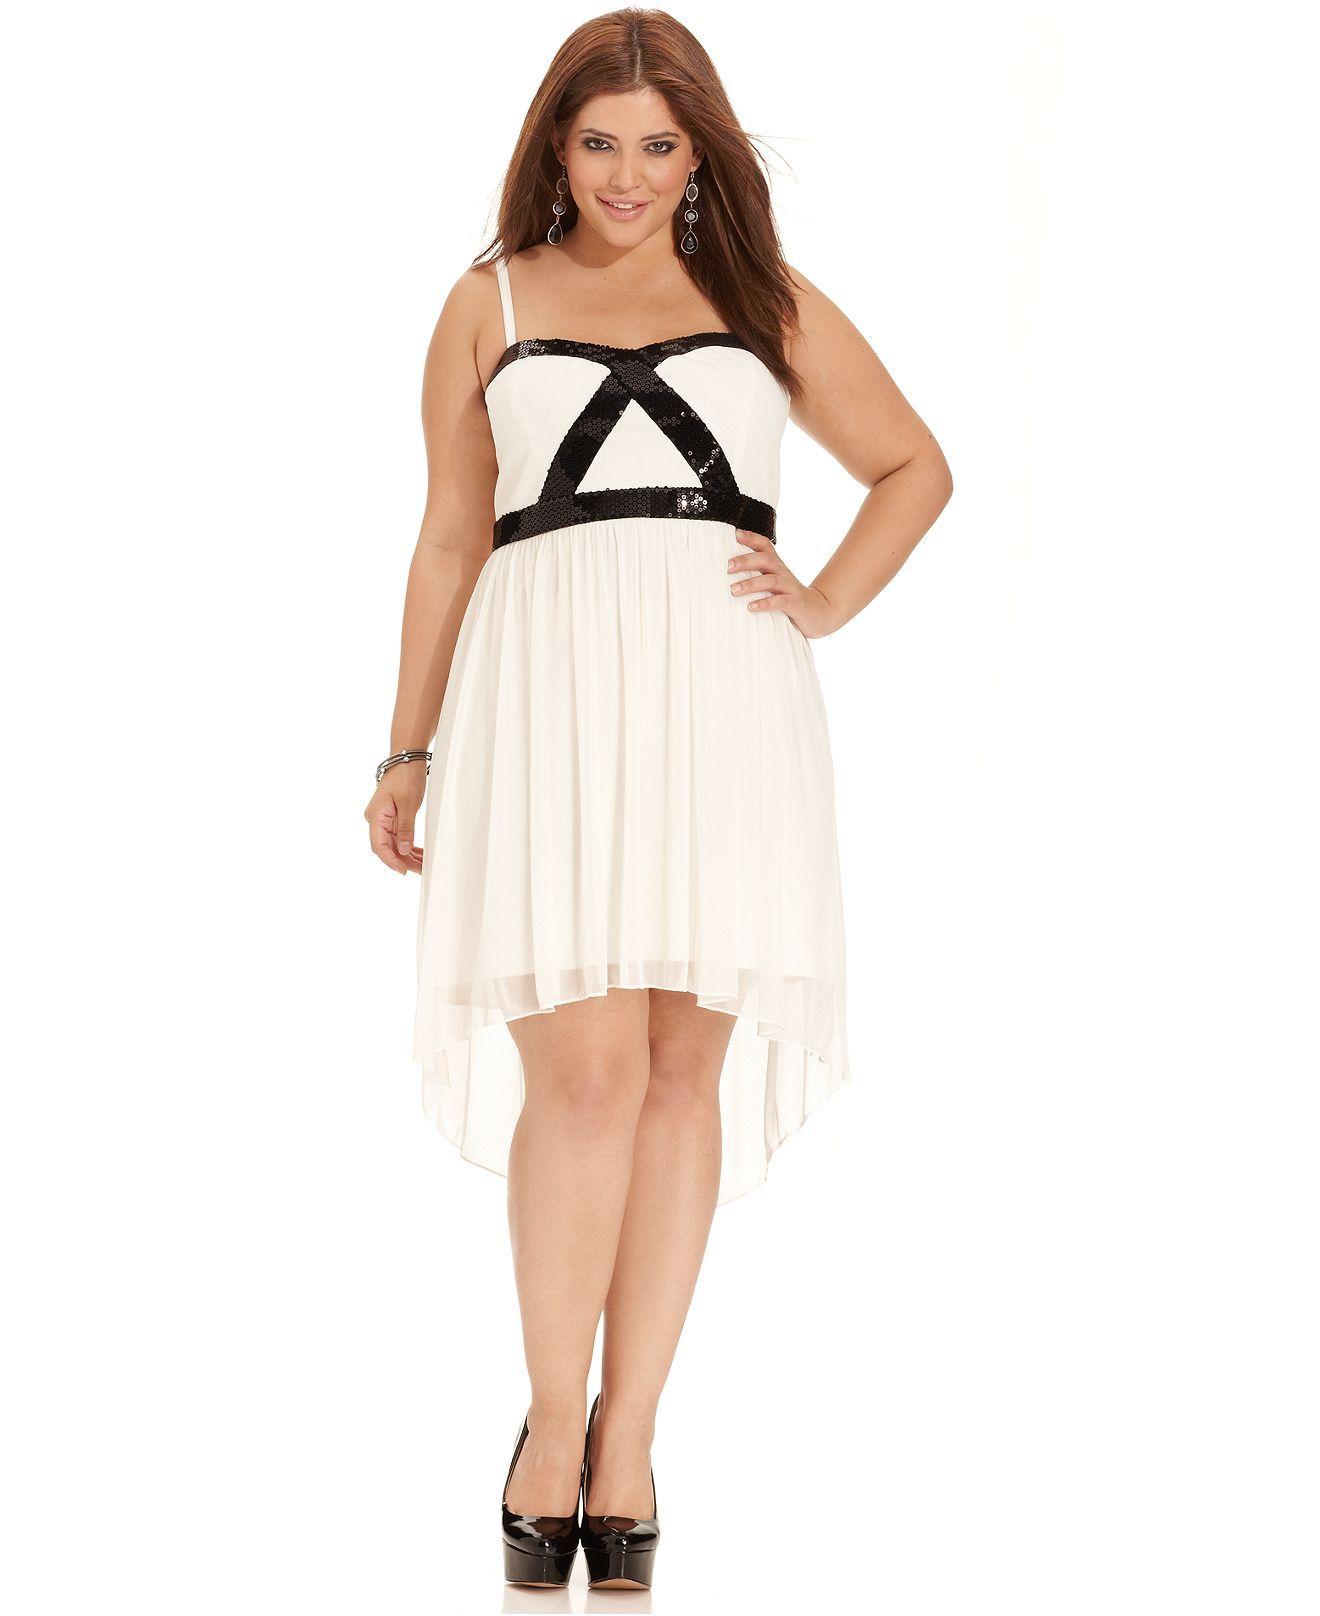 Trixxi Plus Size Dress, Sleeveless Sequin High-Low - Plus ...